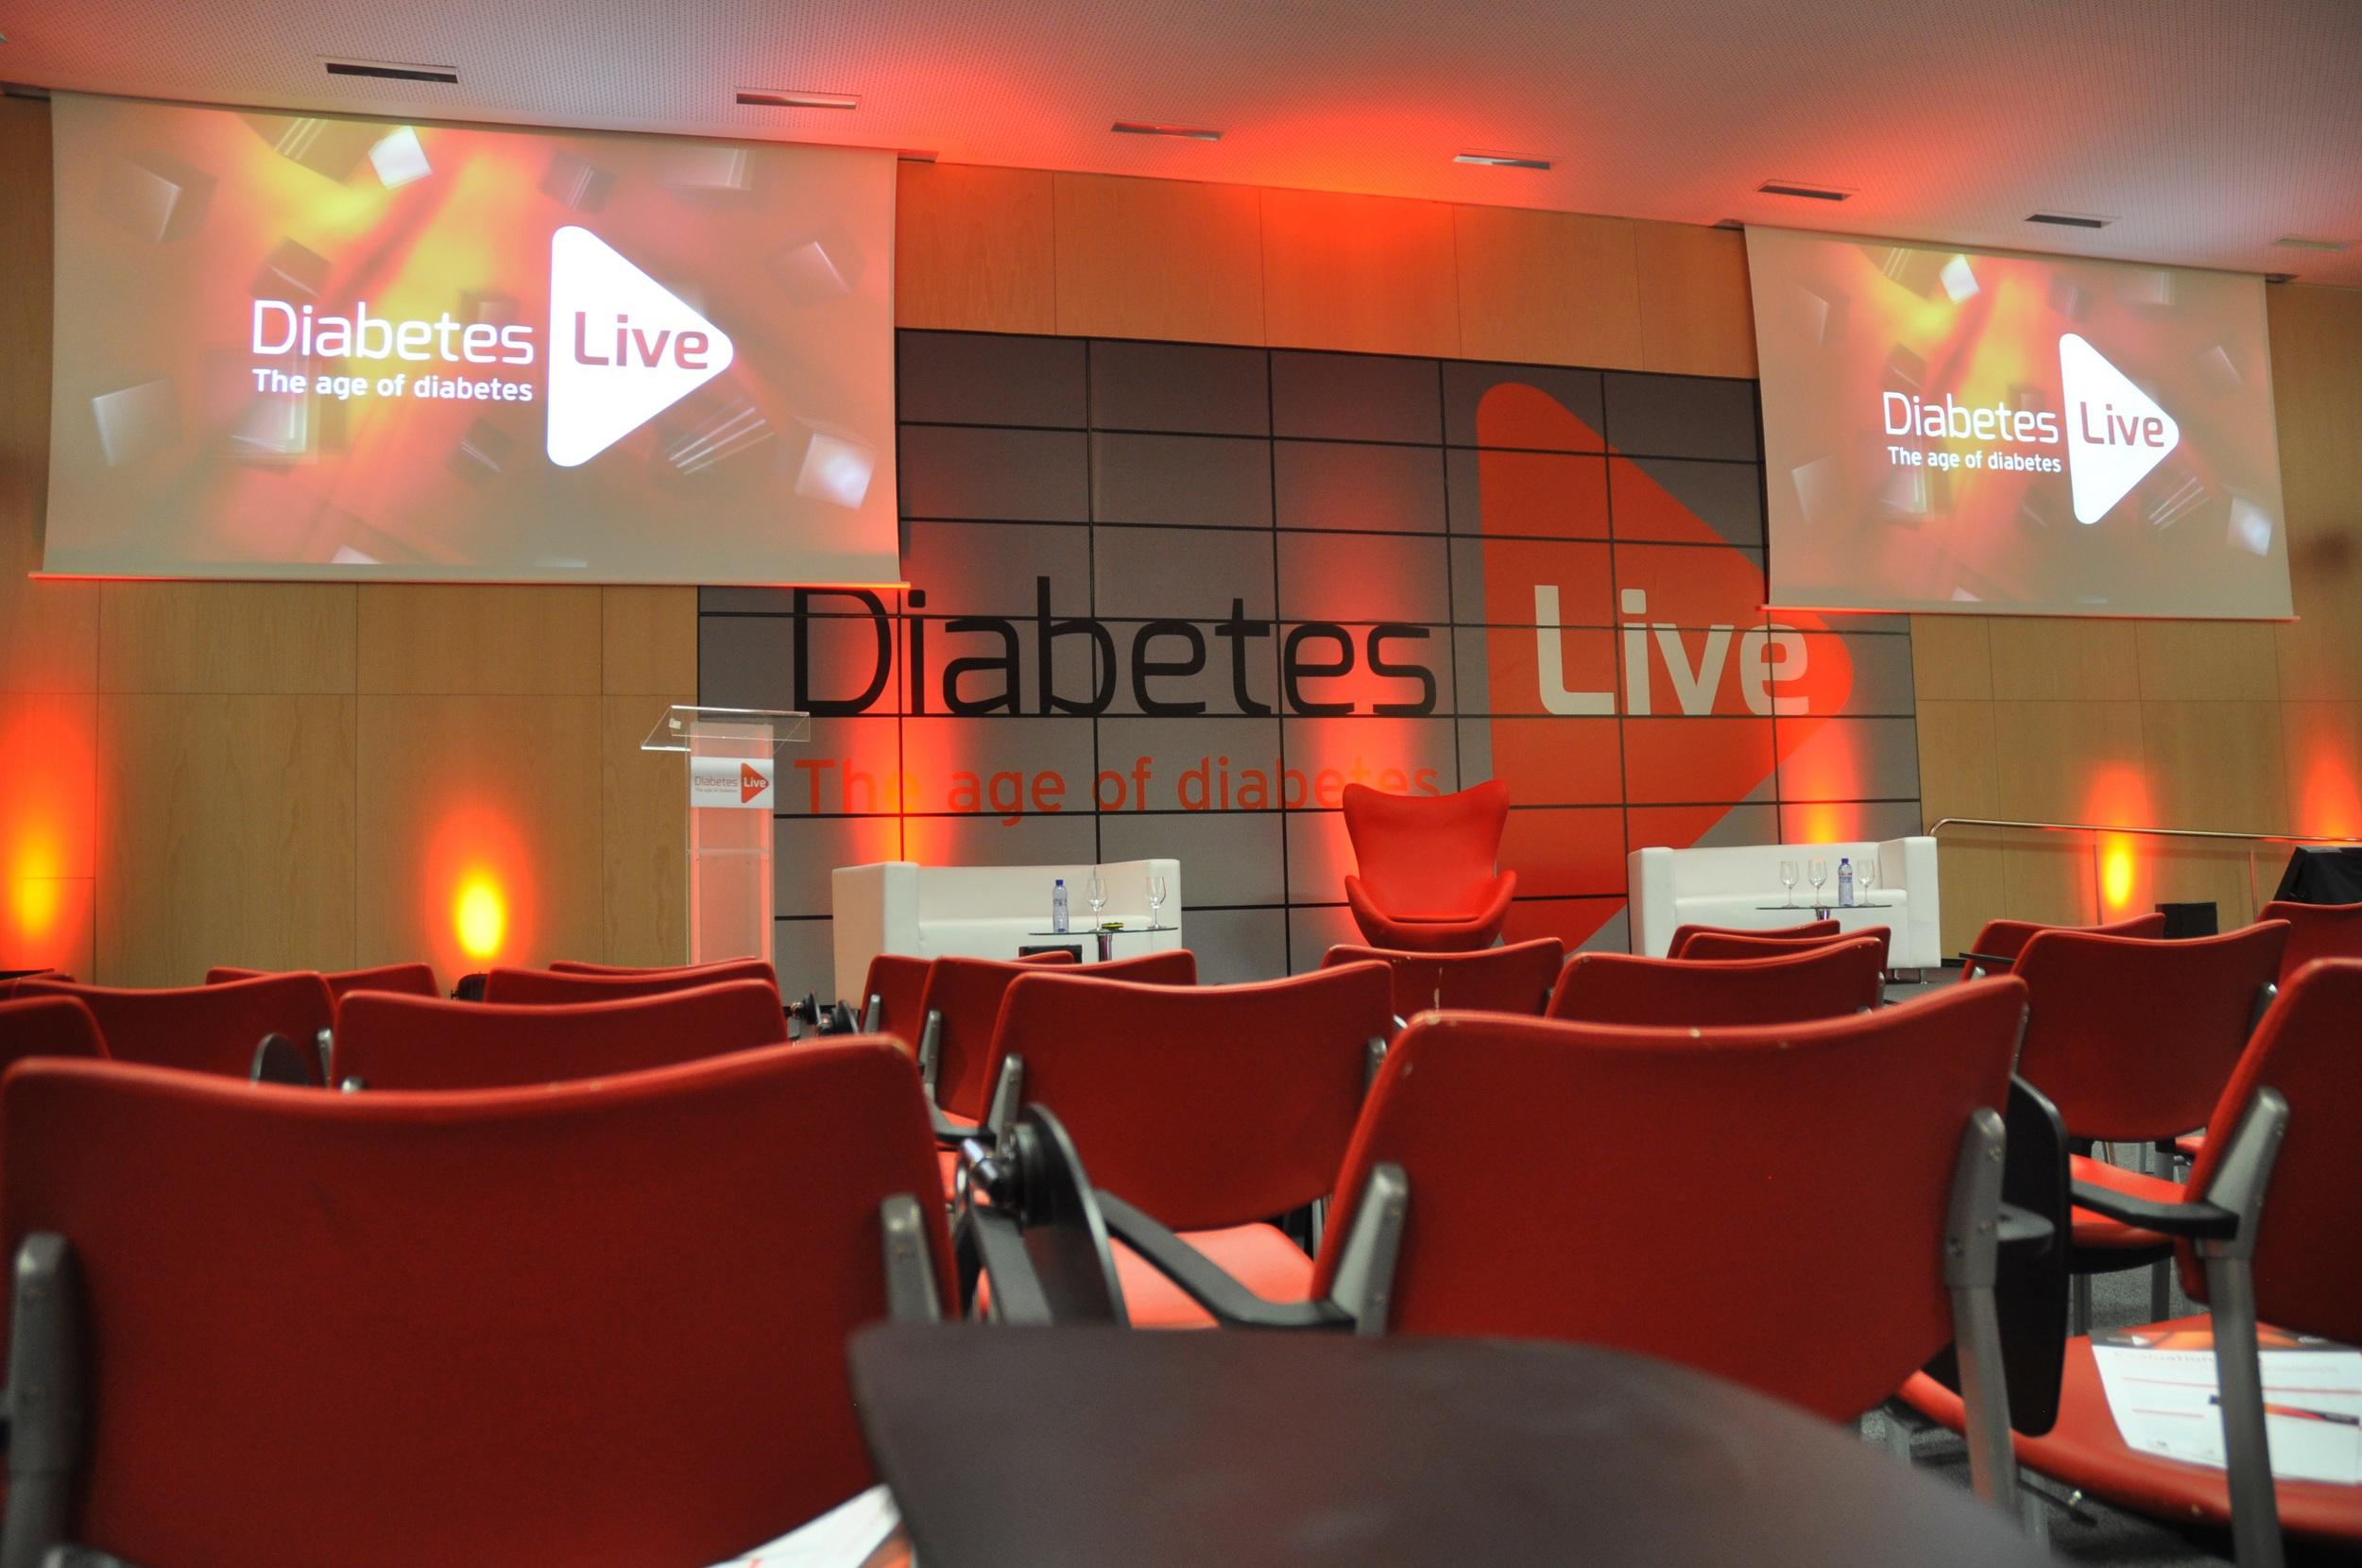 Diabetes Live Clear Clingz Tiled